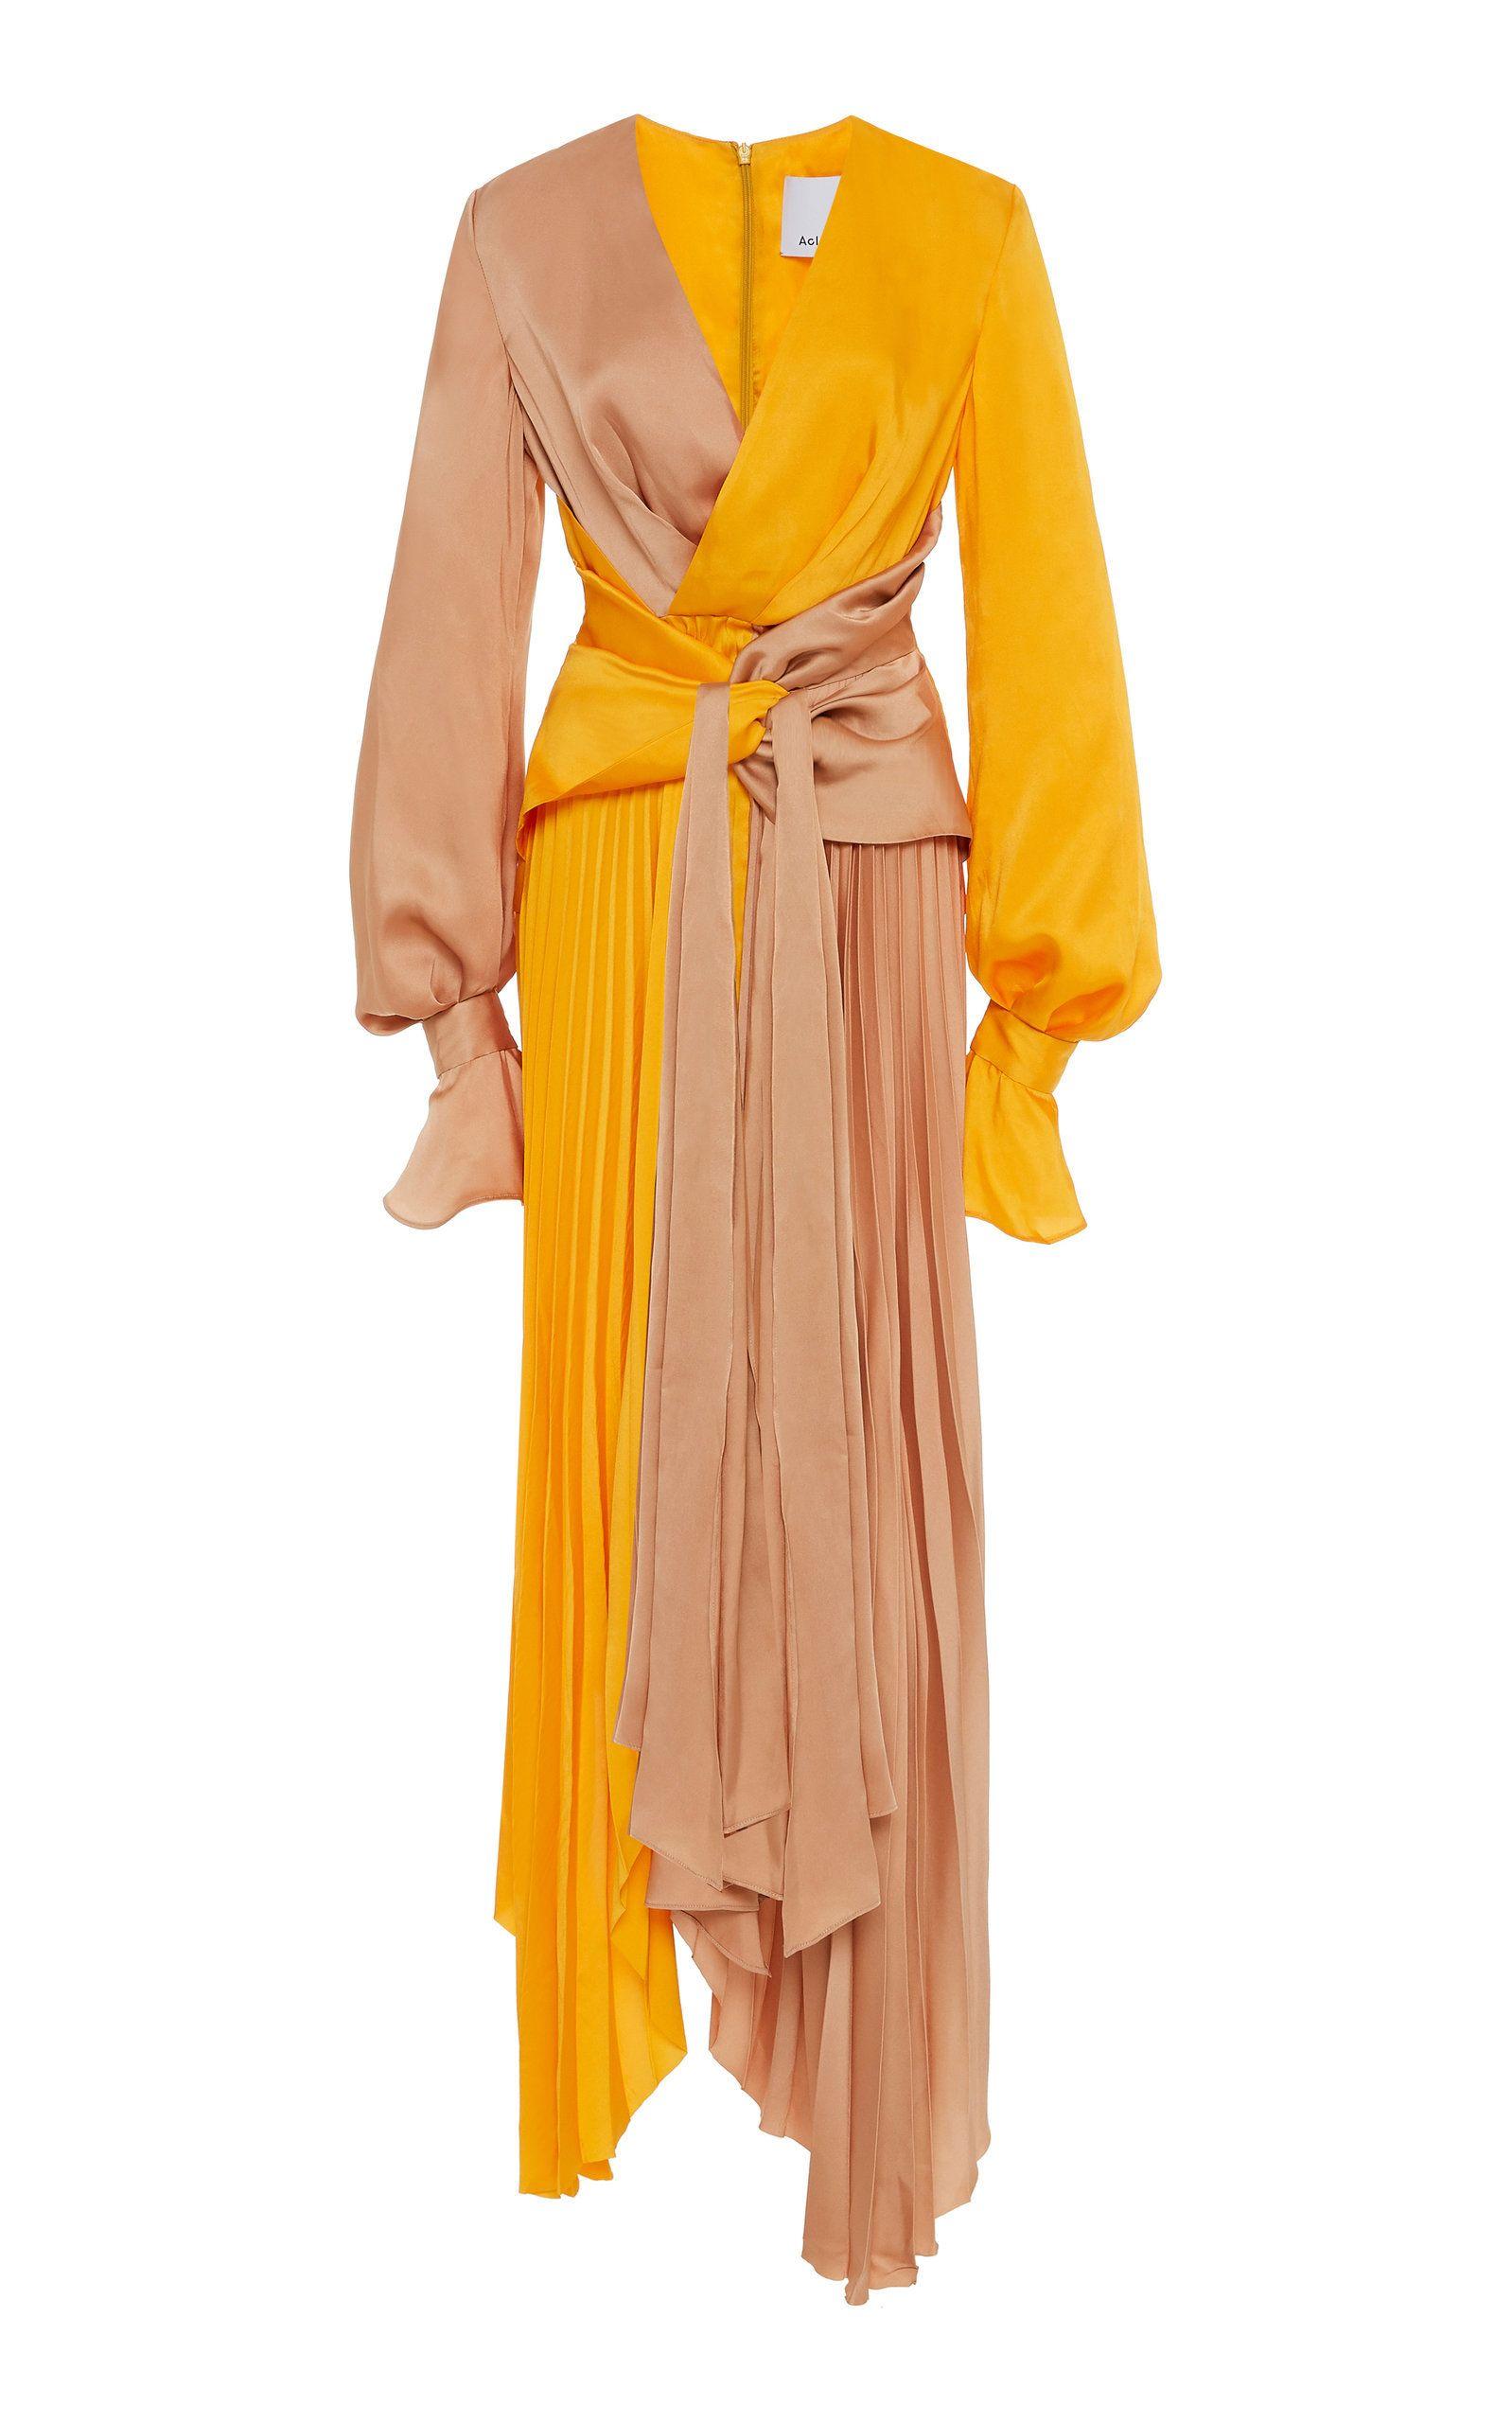 Acler Empire Two Tone Beige Orange Dress 460 Fashion Fashion Outfits Fashion Dresses [ 2560 x 1598 Pixel ]